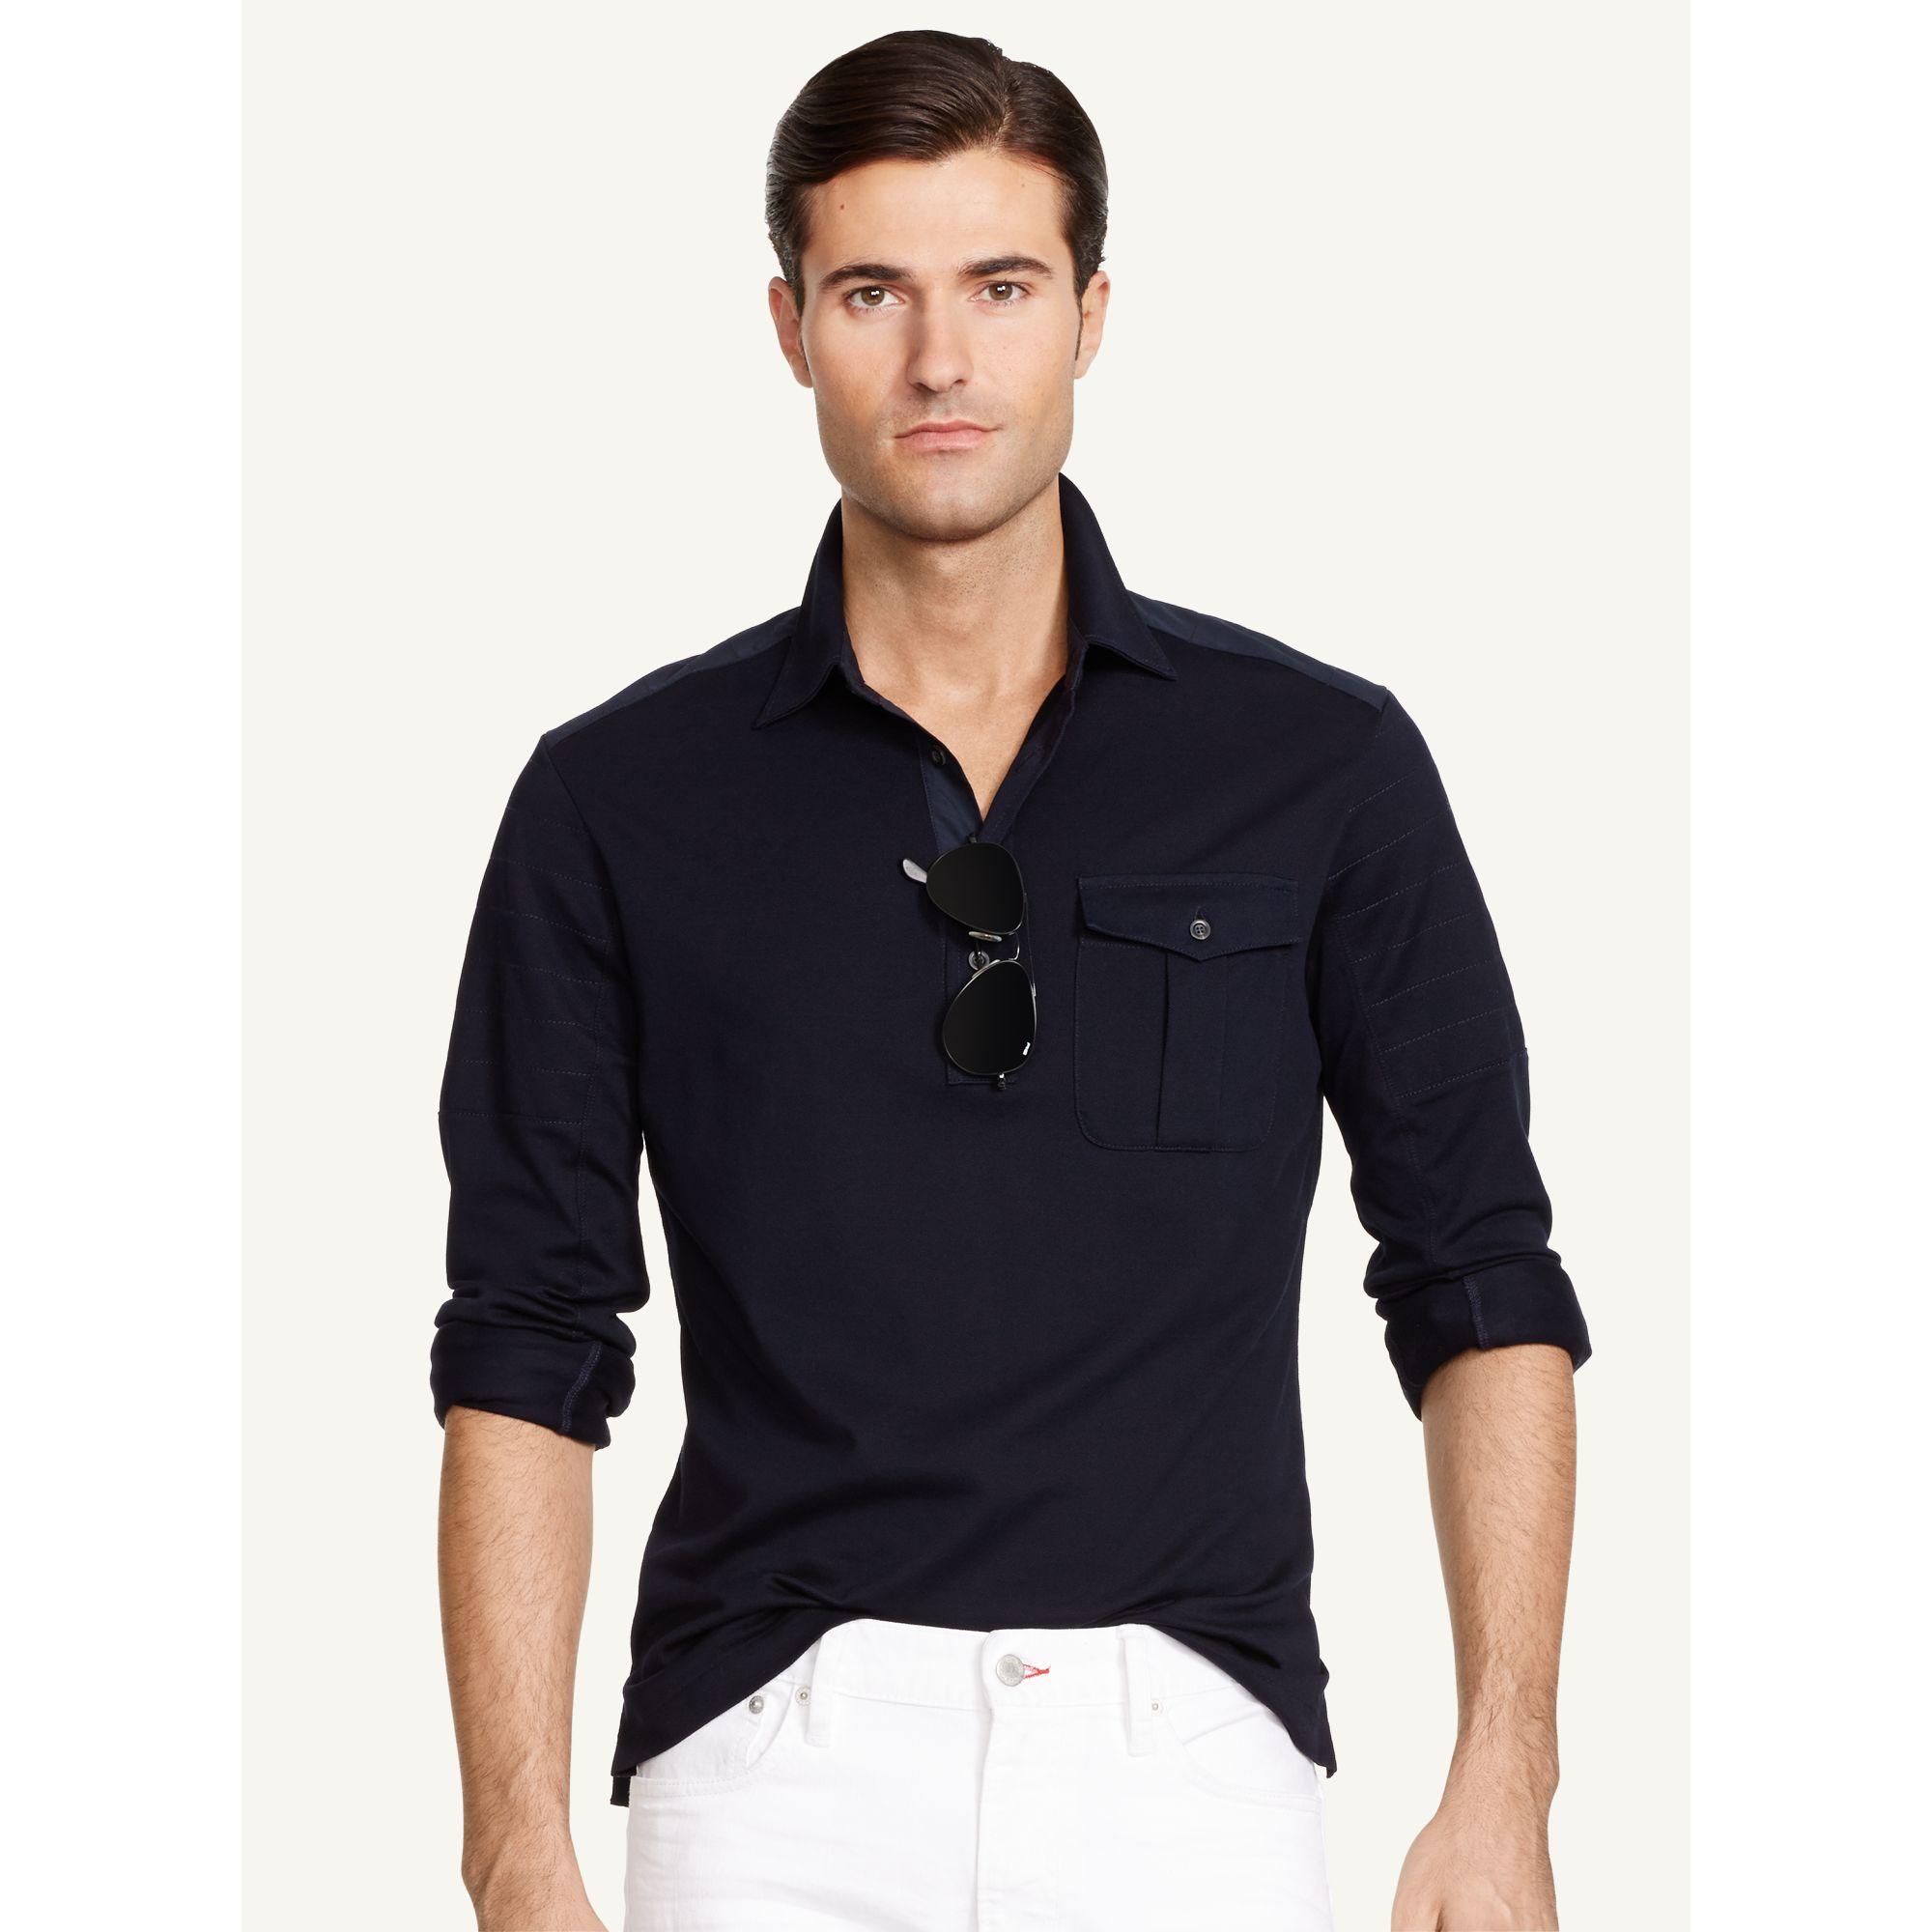 Lyst ralph lauren black label military inspired polo for Ralph lauren black label polo shirt